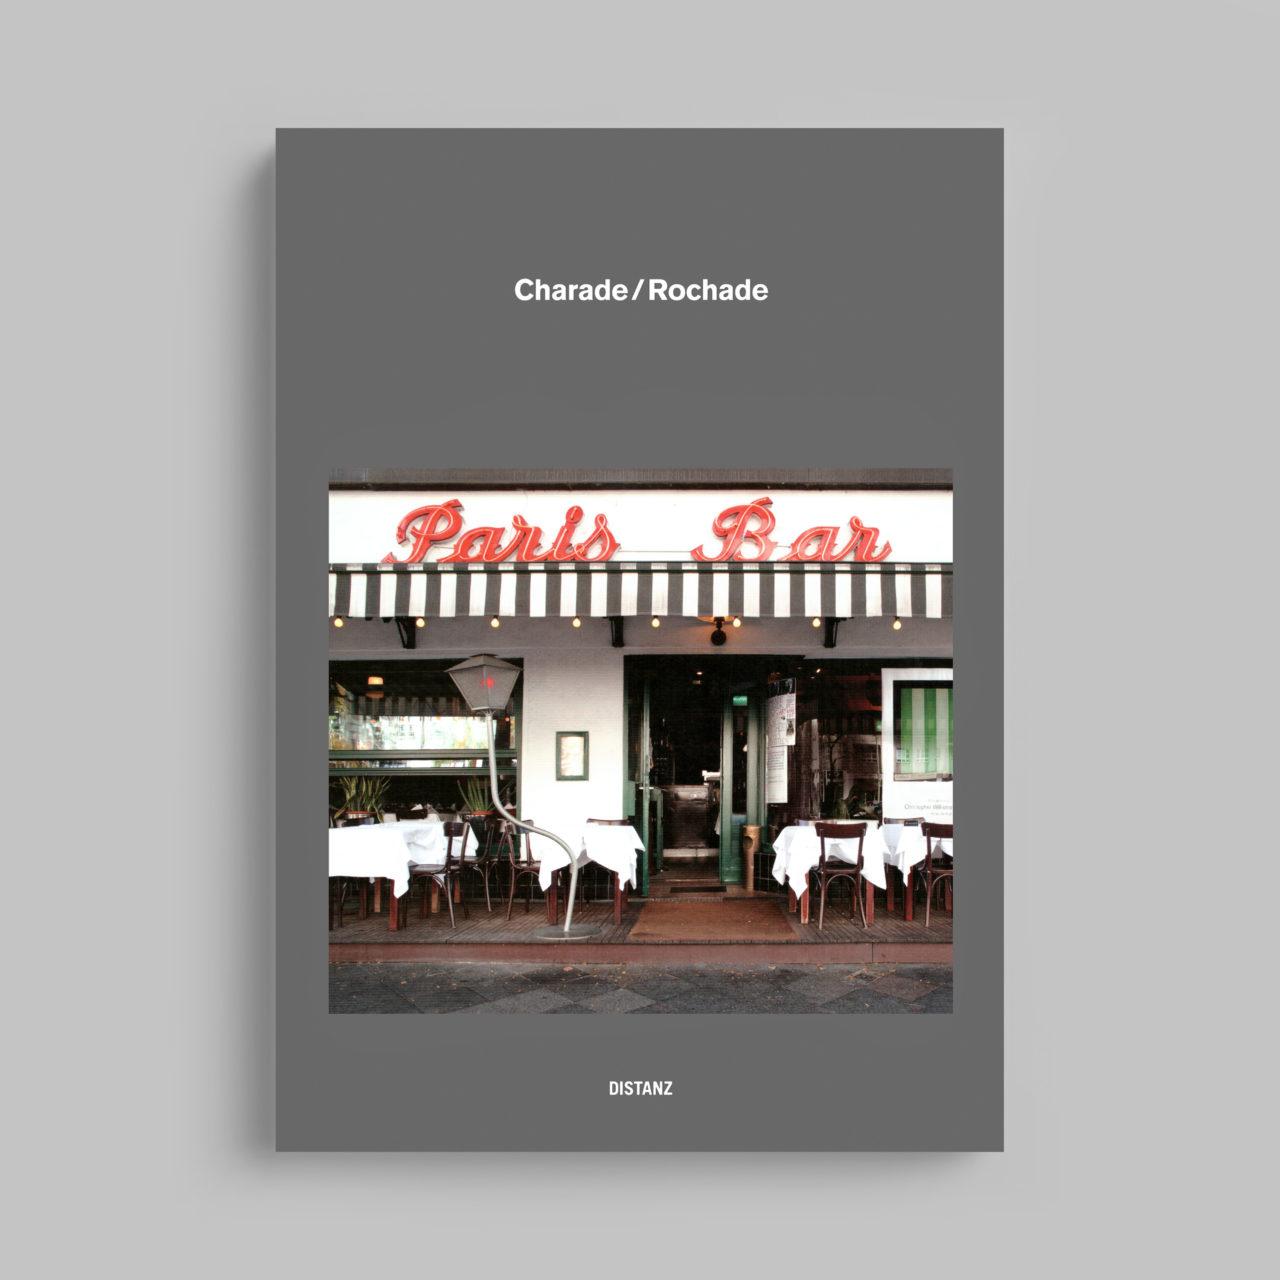 Charade/Rochade, Distanz Verlag (2013)